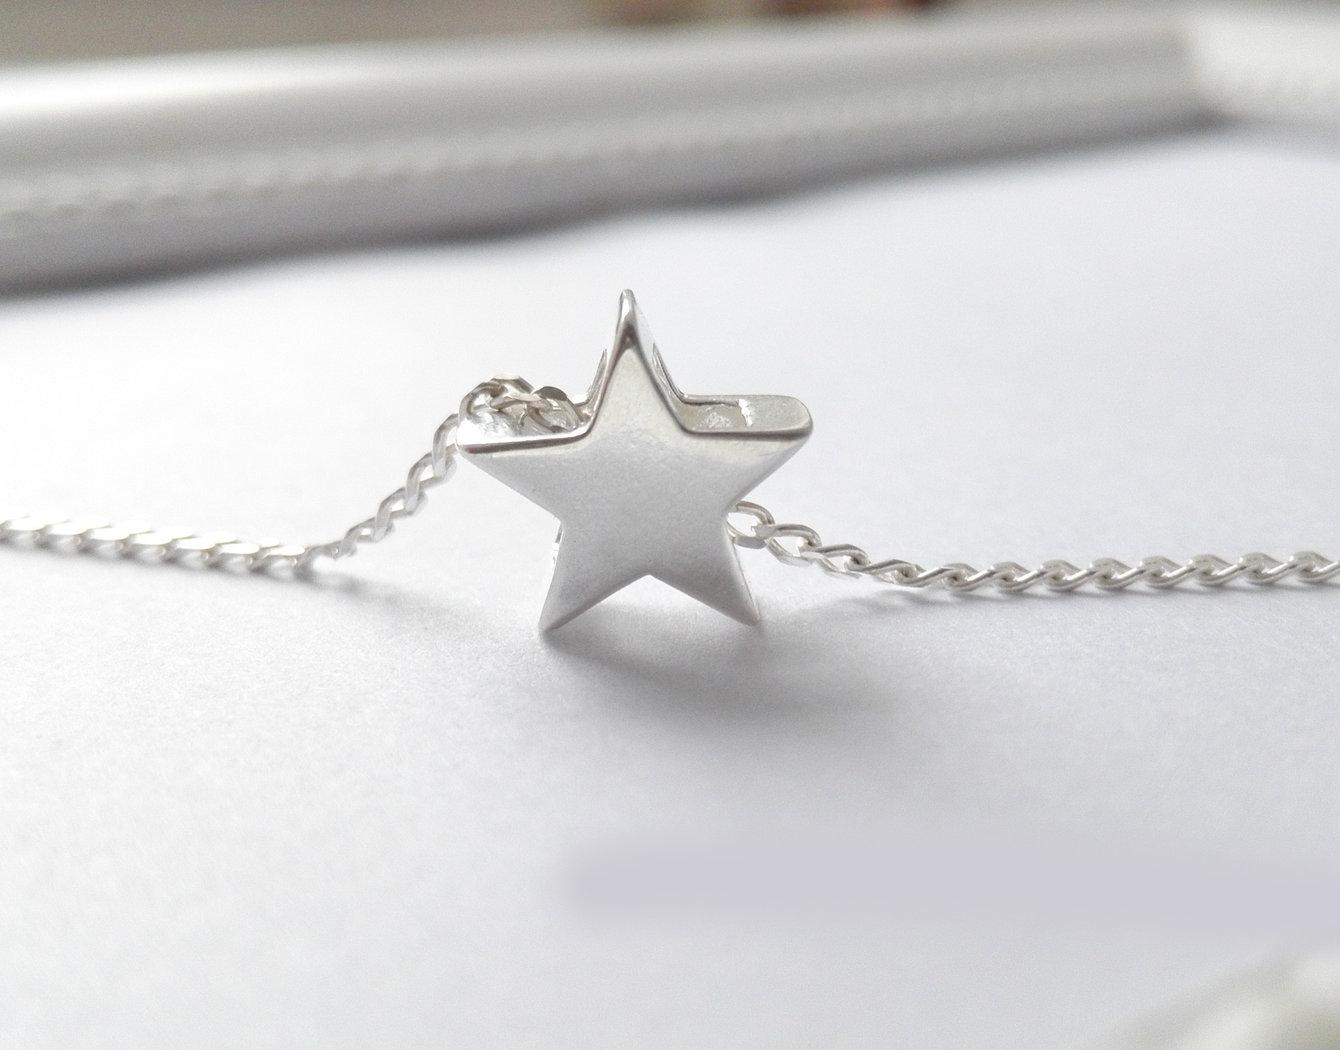 Stern Kette massiv echt 925 Sterling Silber, Halskette, Glück & Frieden